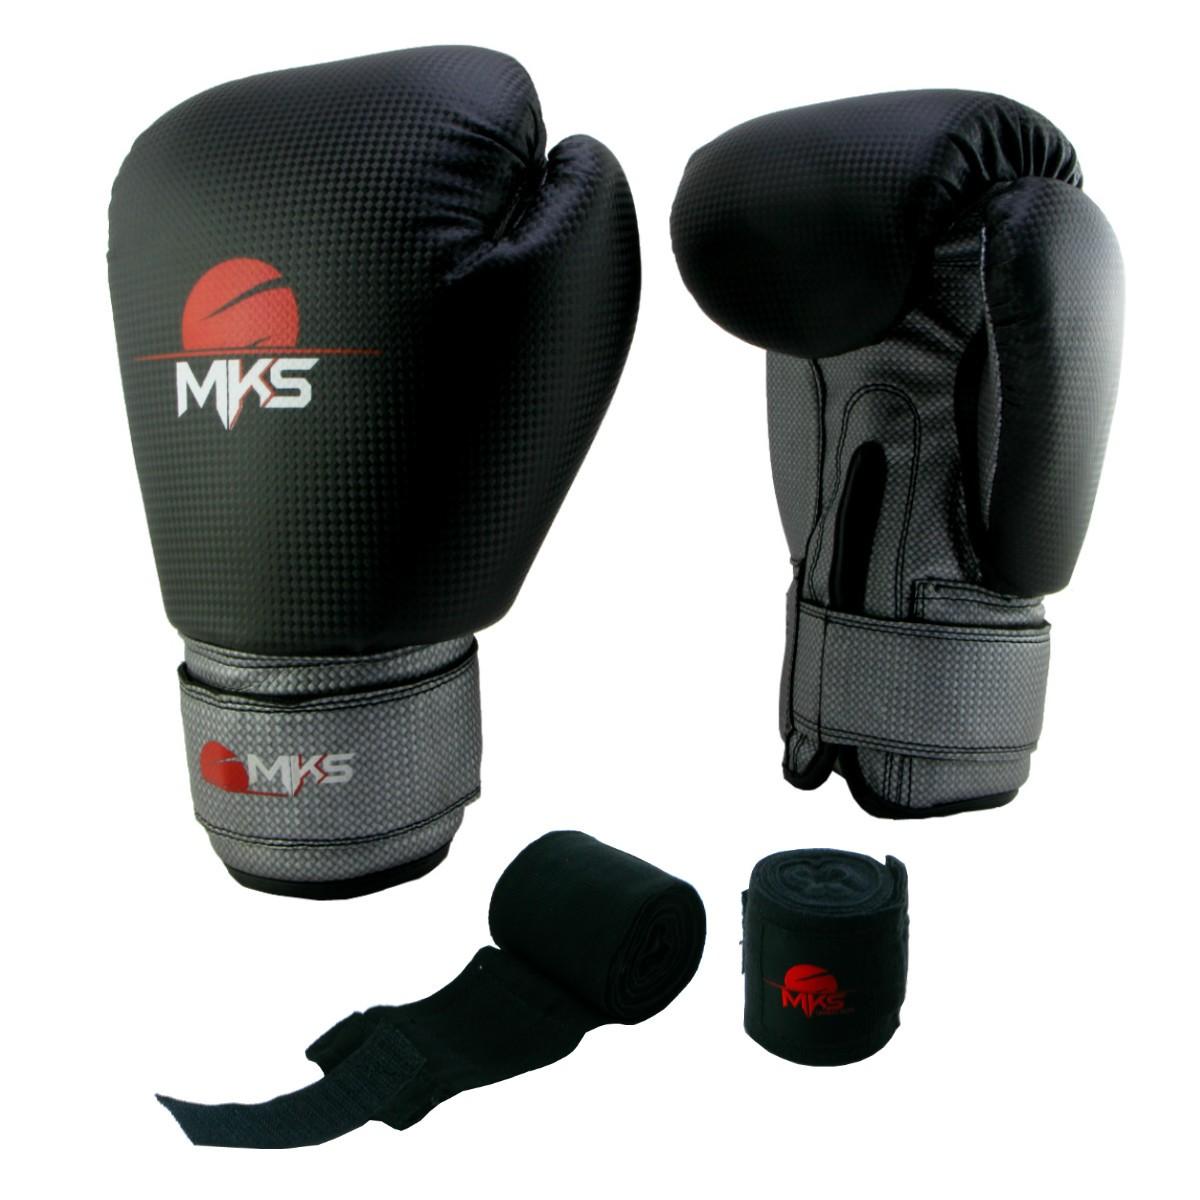 Luva de Boxe Prospect MKS Black & Silver 14 oz + bandagem